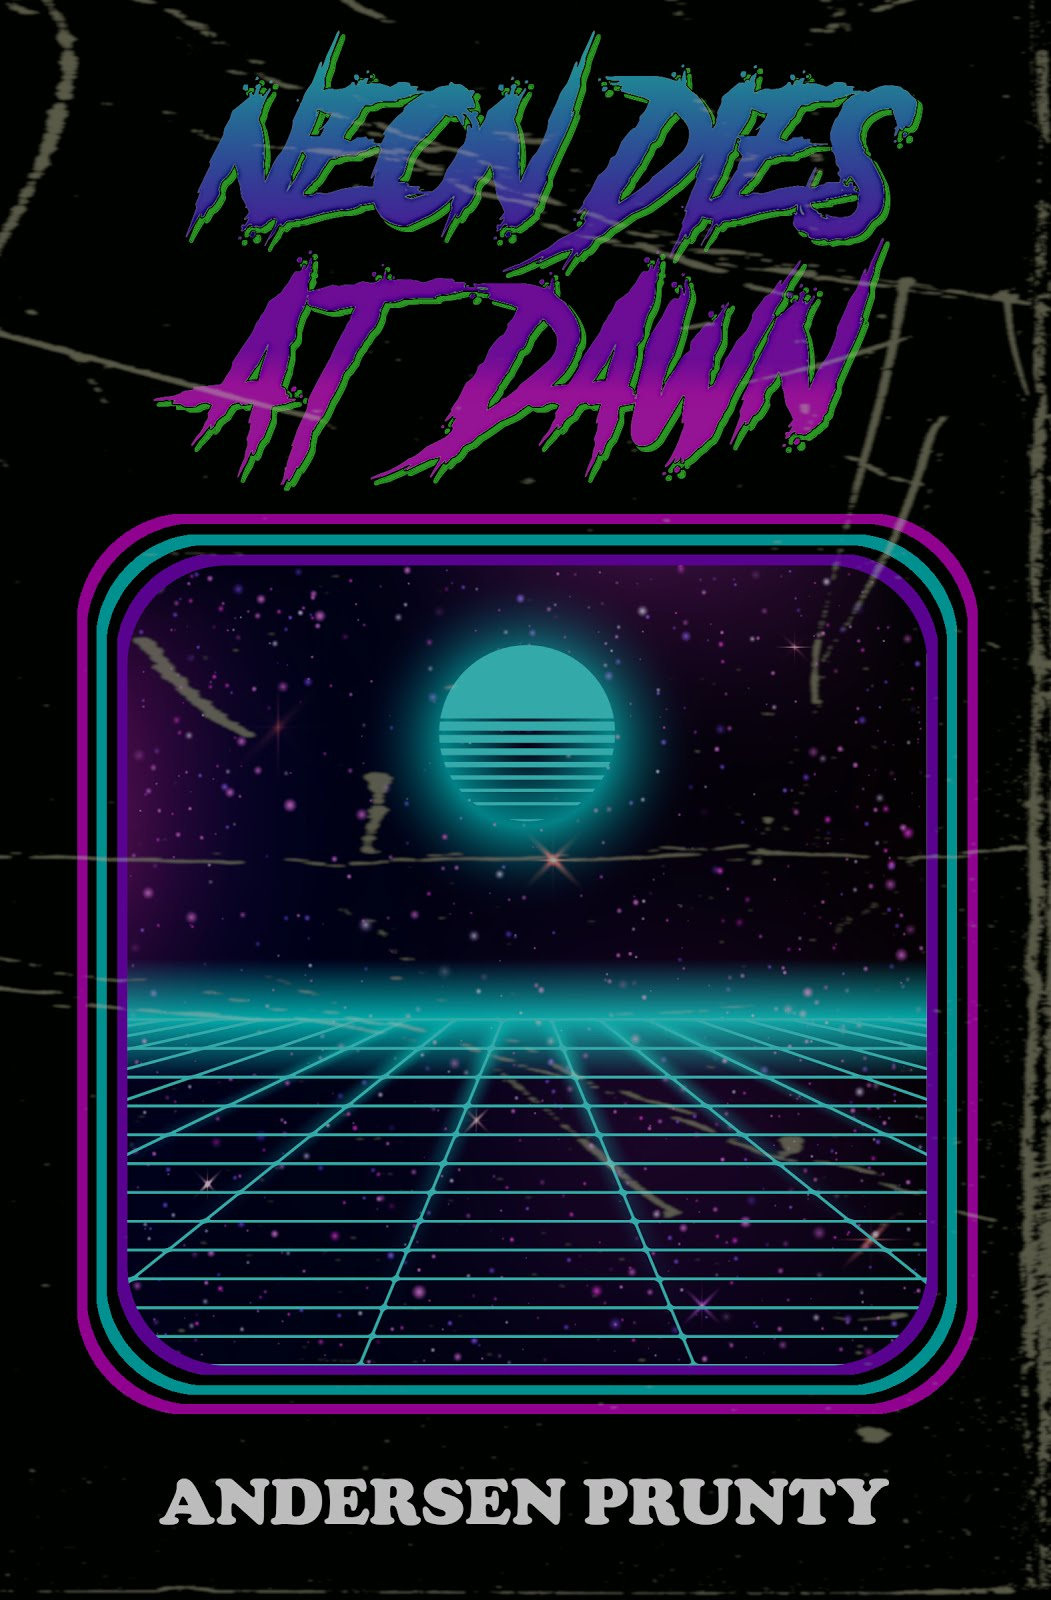 Neon Dies At Dawn